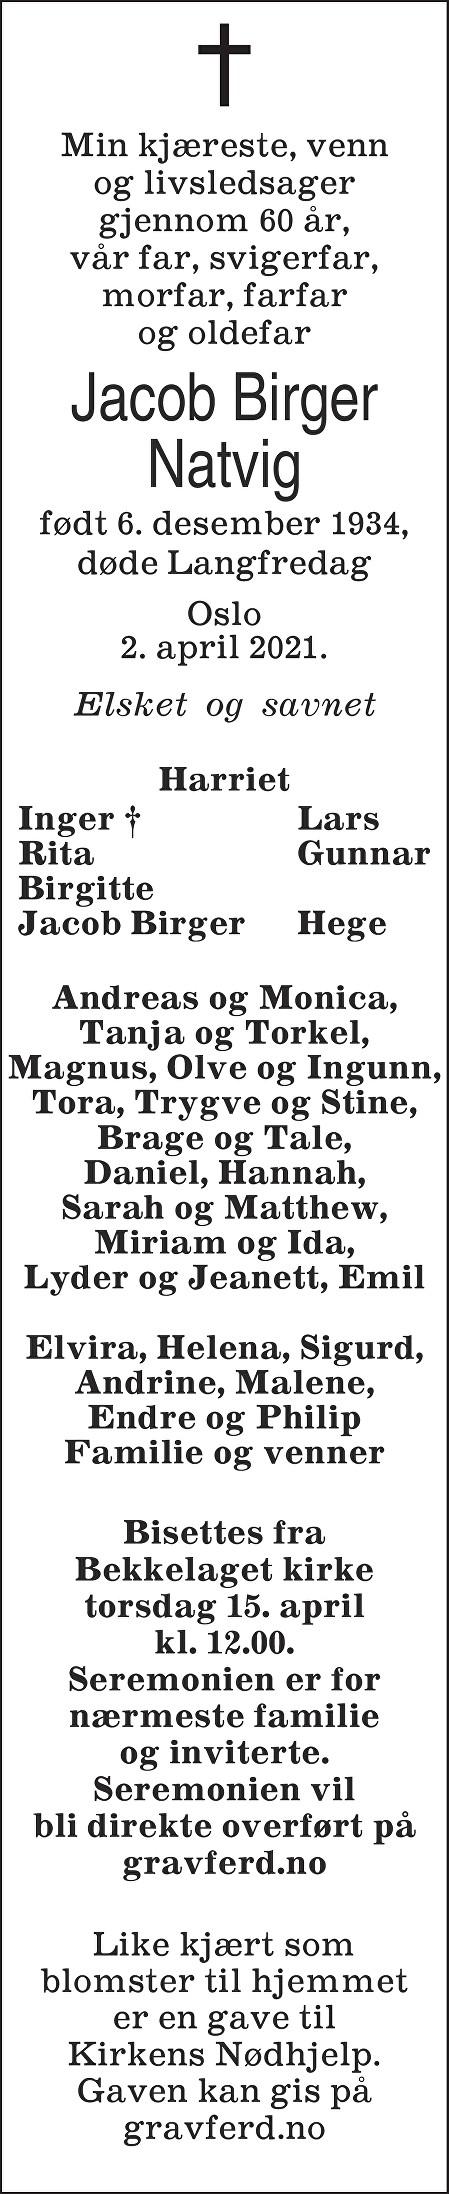 Jacob Birger Natvig Dødsannonse